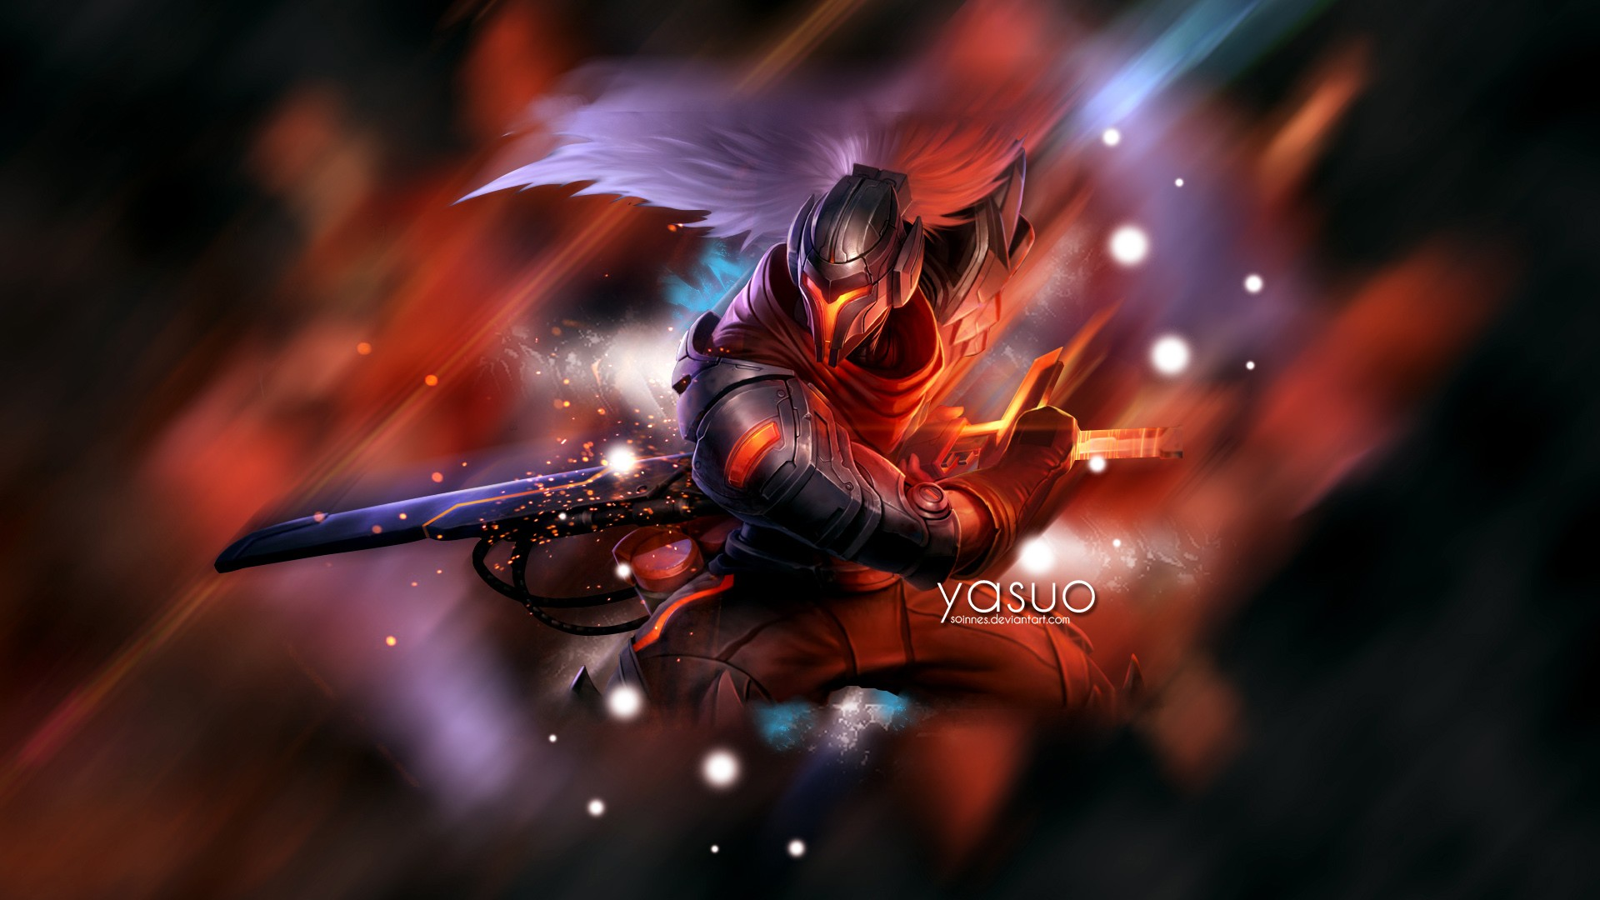 Project Yasuo Wallpapers Fan Arts League Of Legends